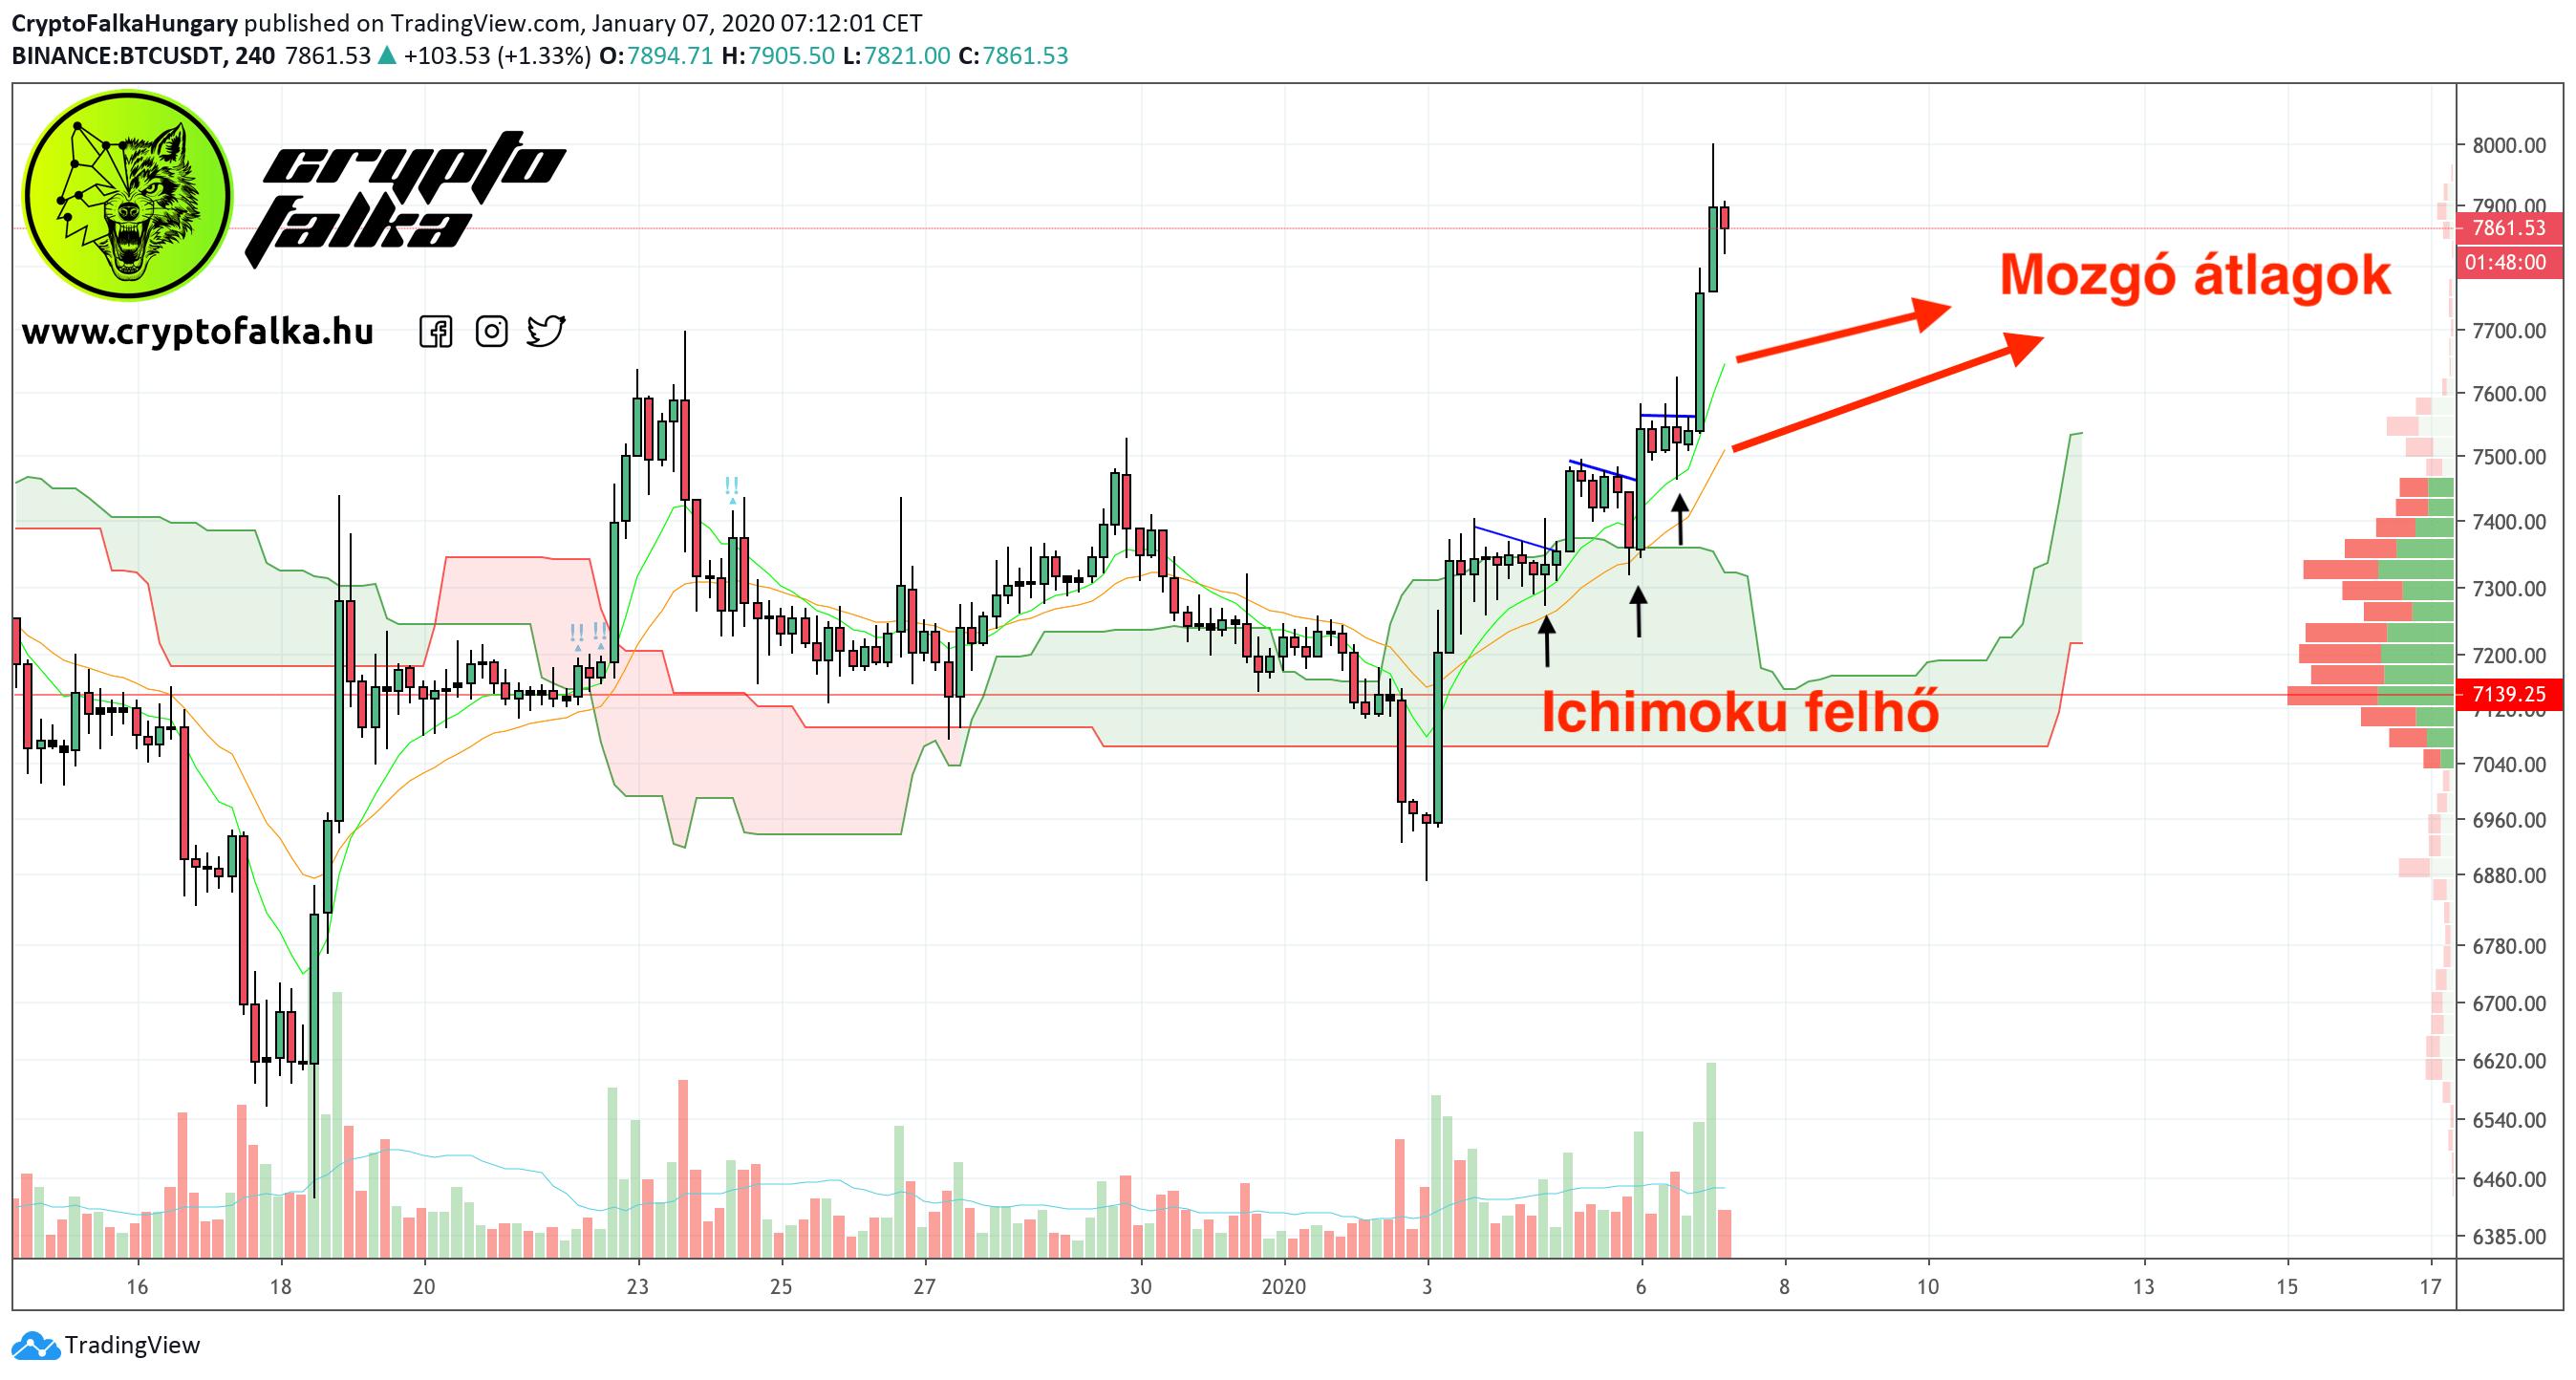 Bitcoin bika piac cryptofalka elemzés